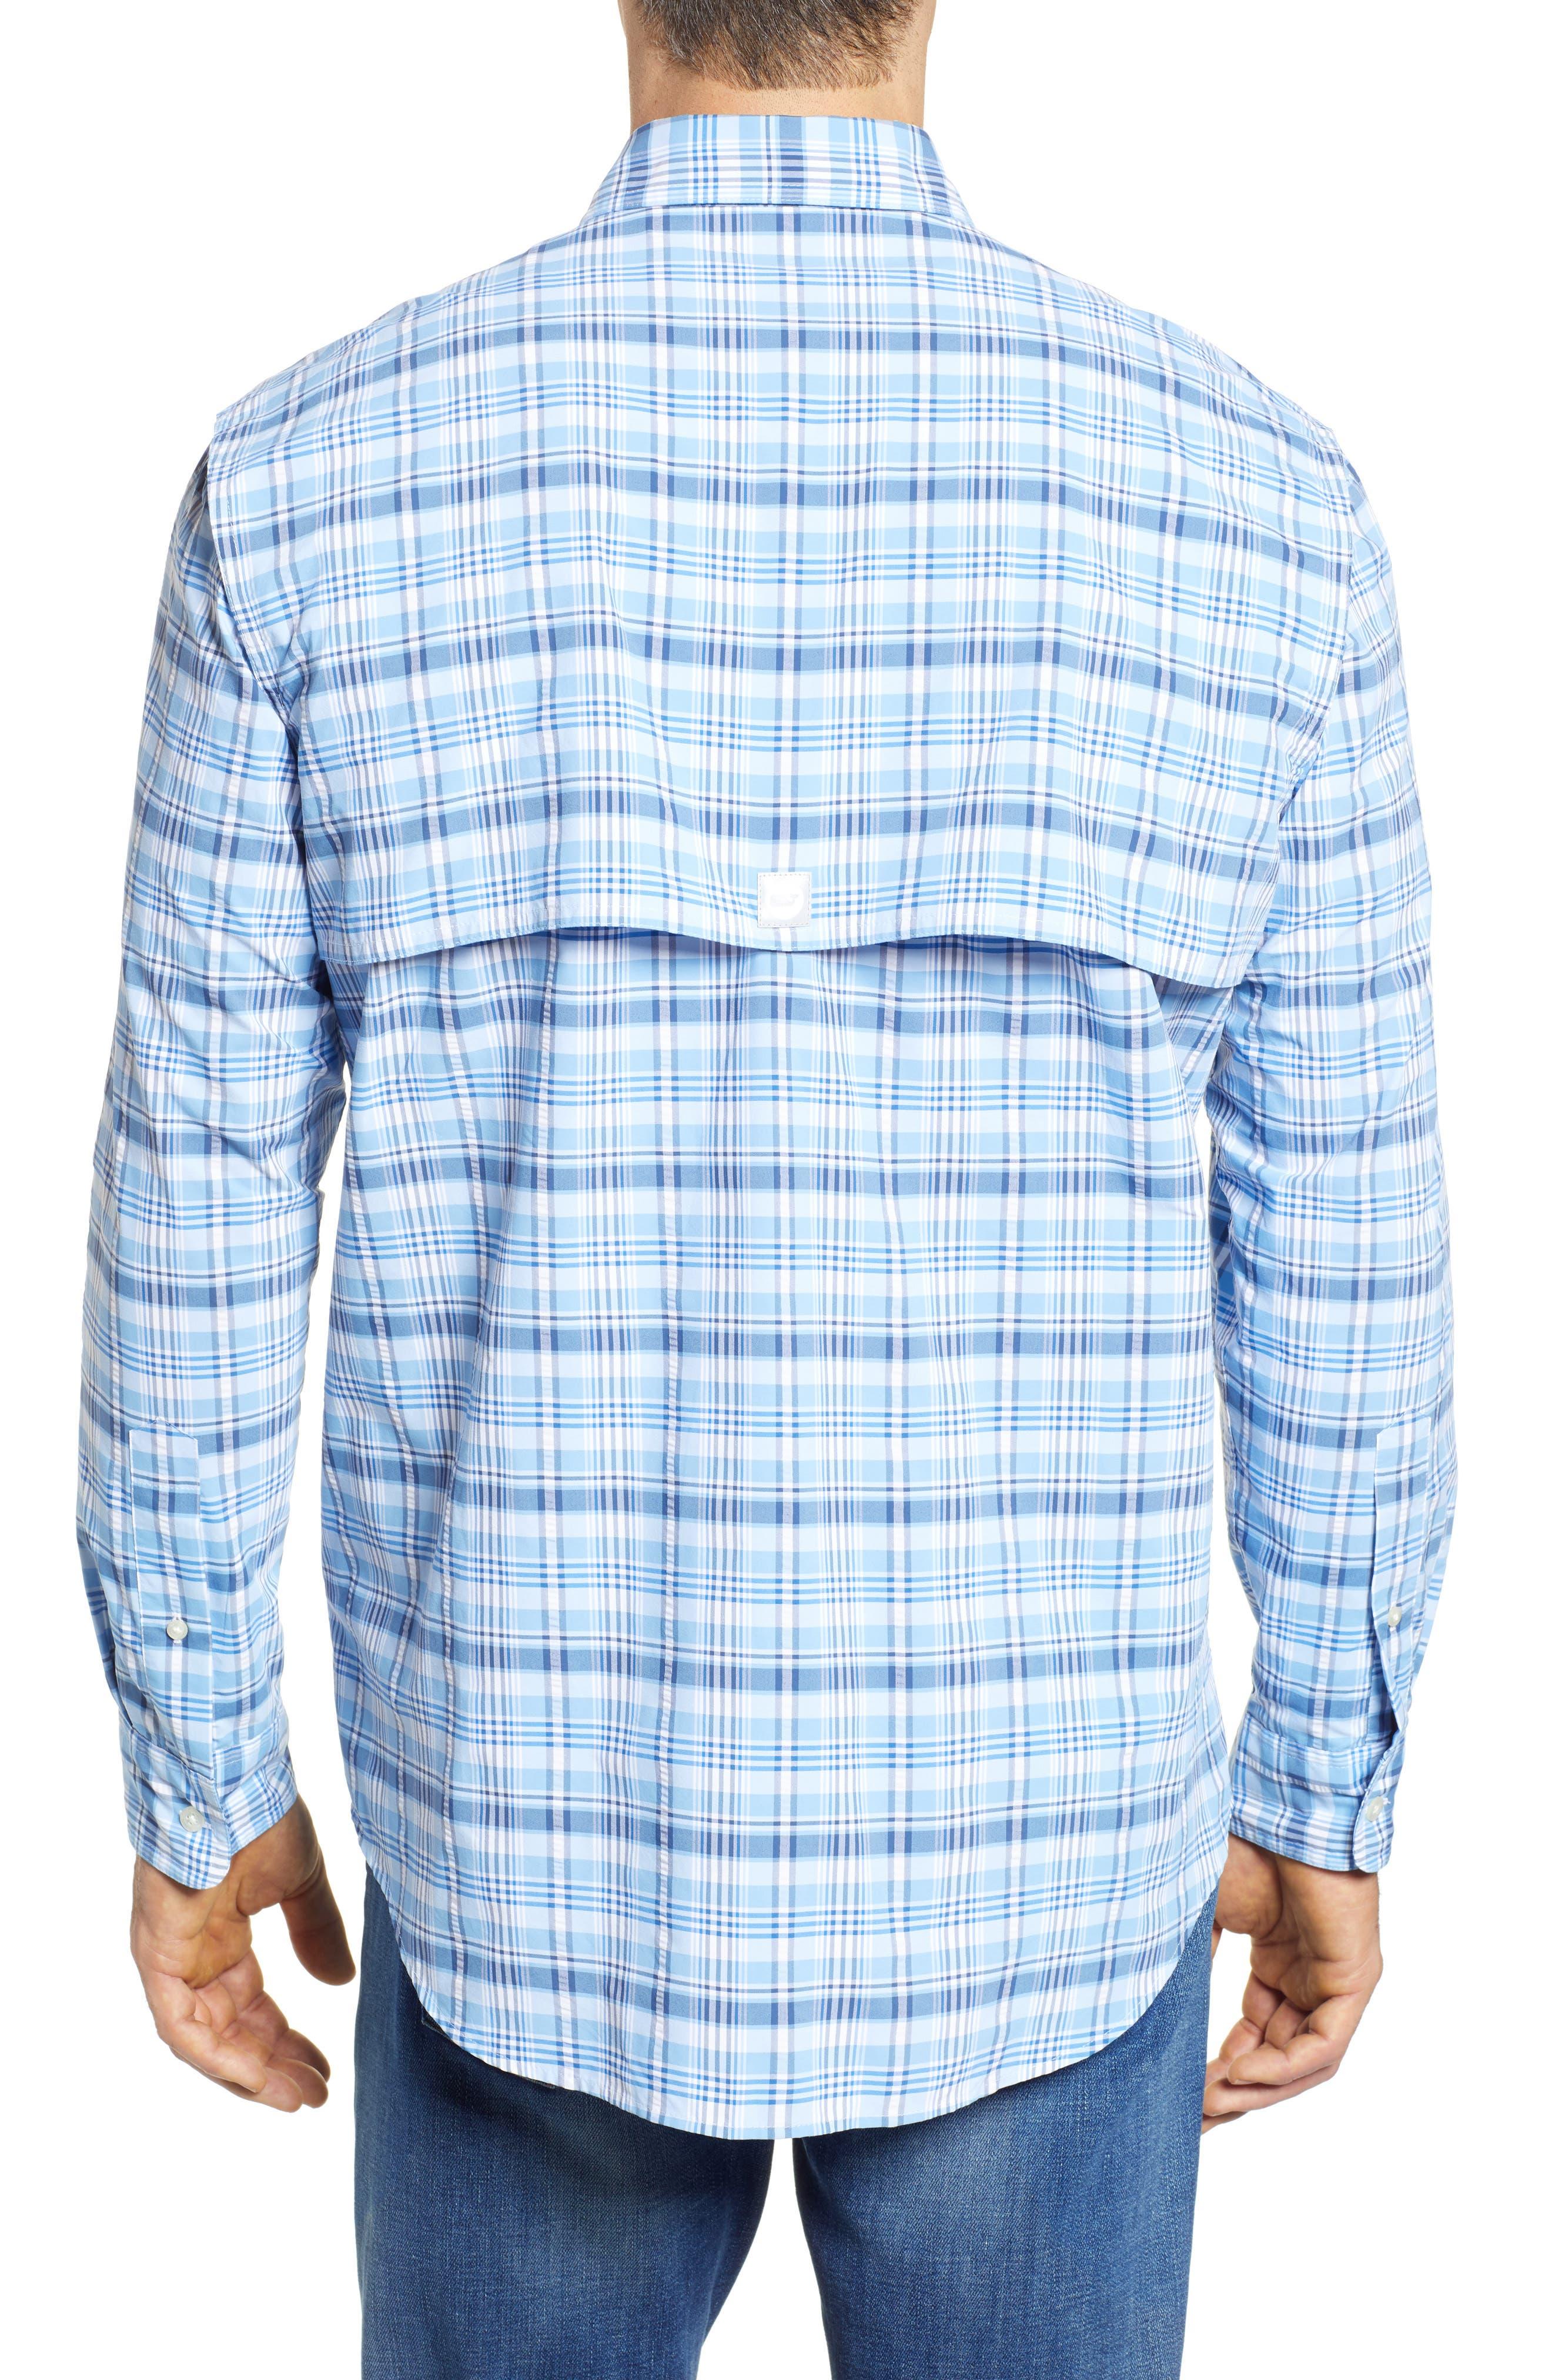 Prospect Hill Harbor Regular Fit Plaid Performance Sport Shirt,                             Alternate thumbnail 2, color,                             484